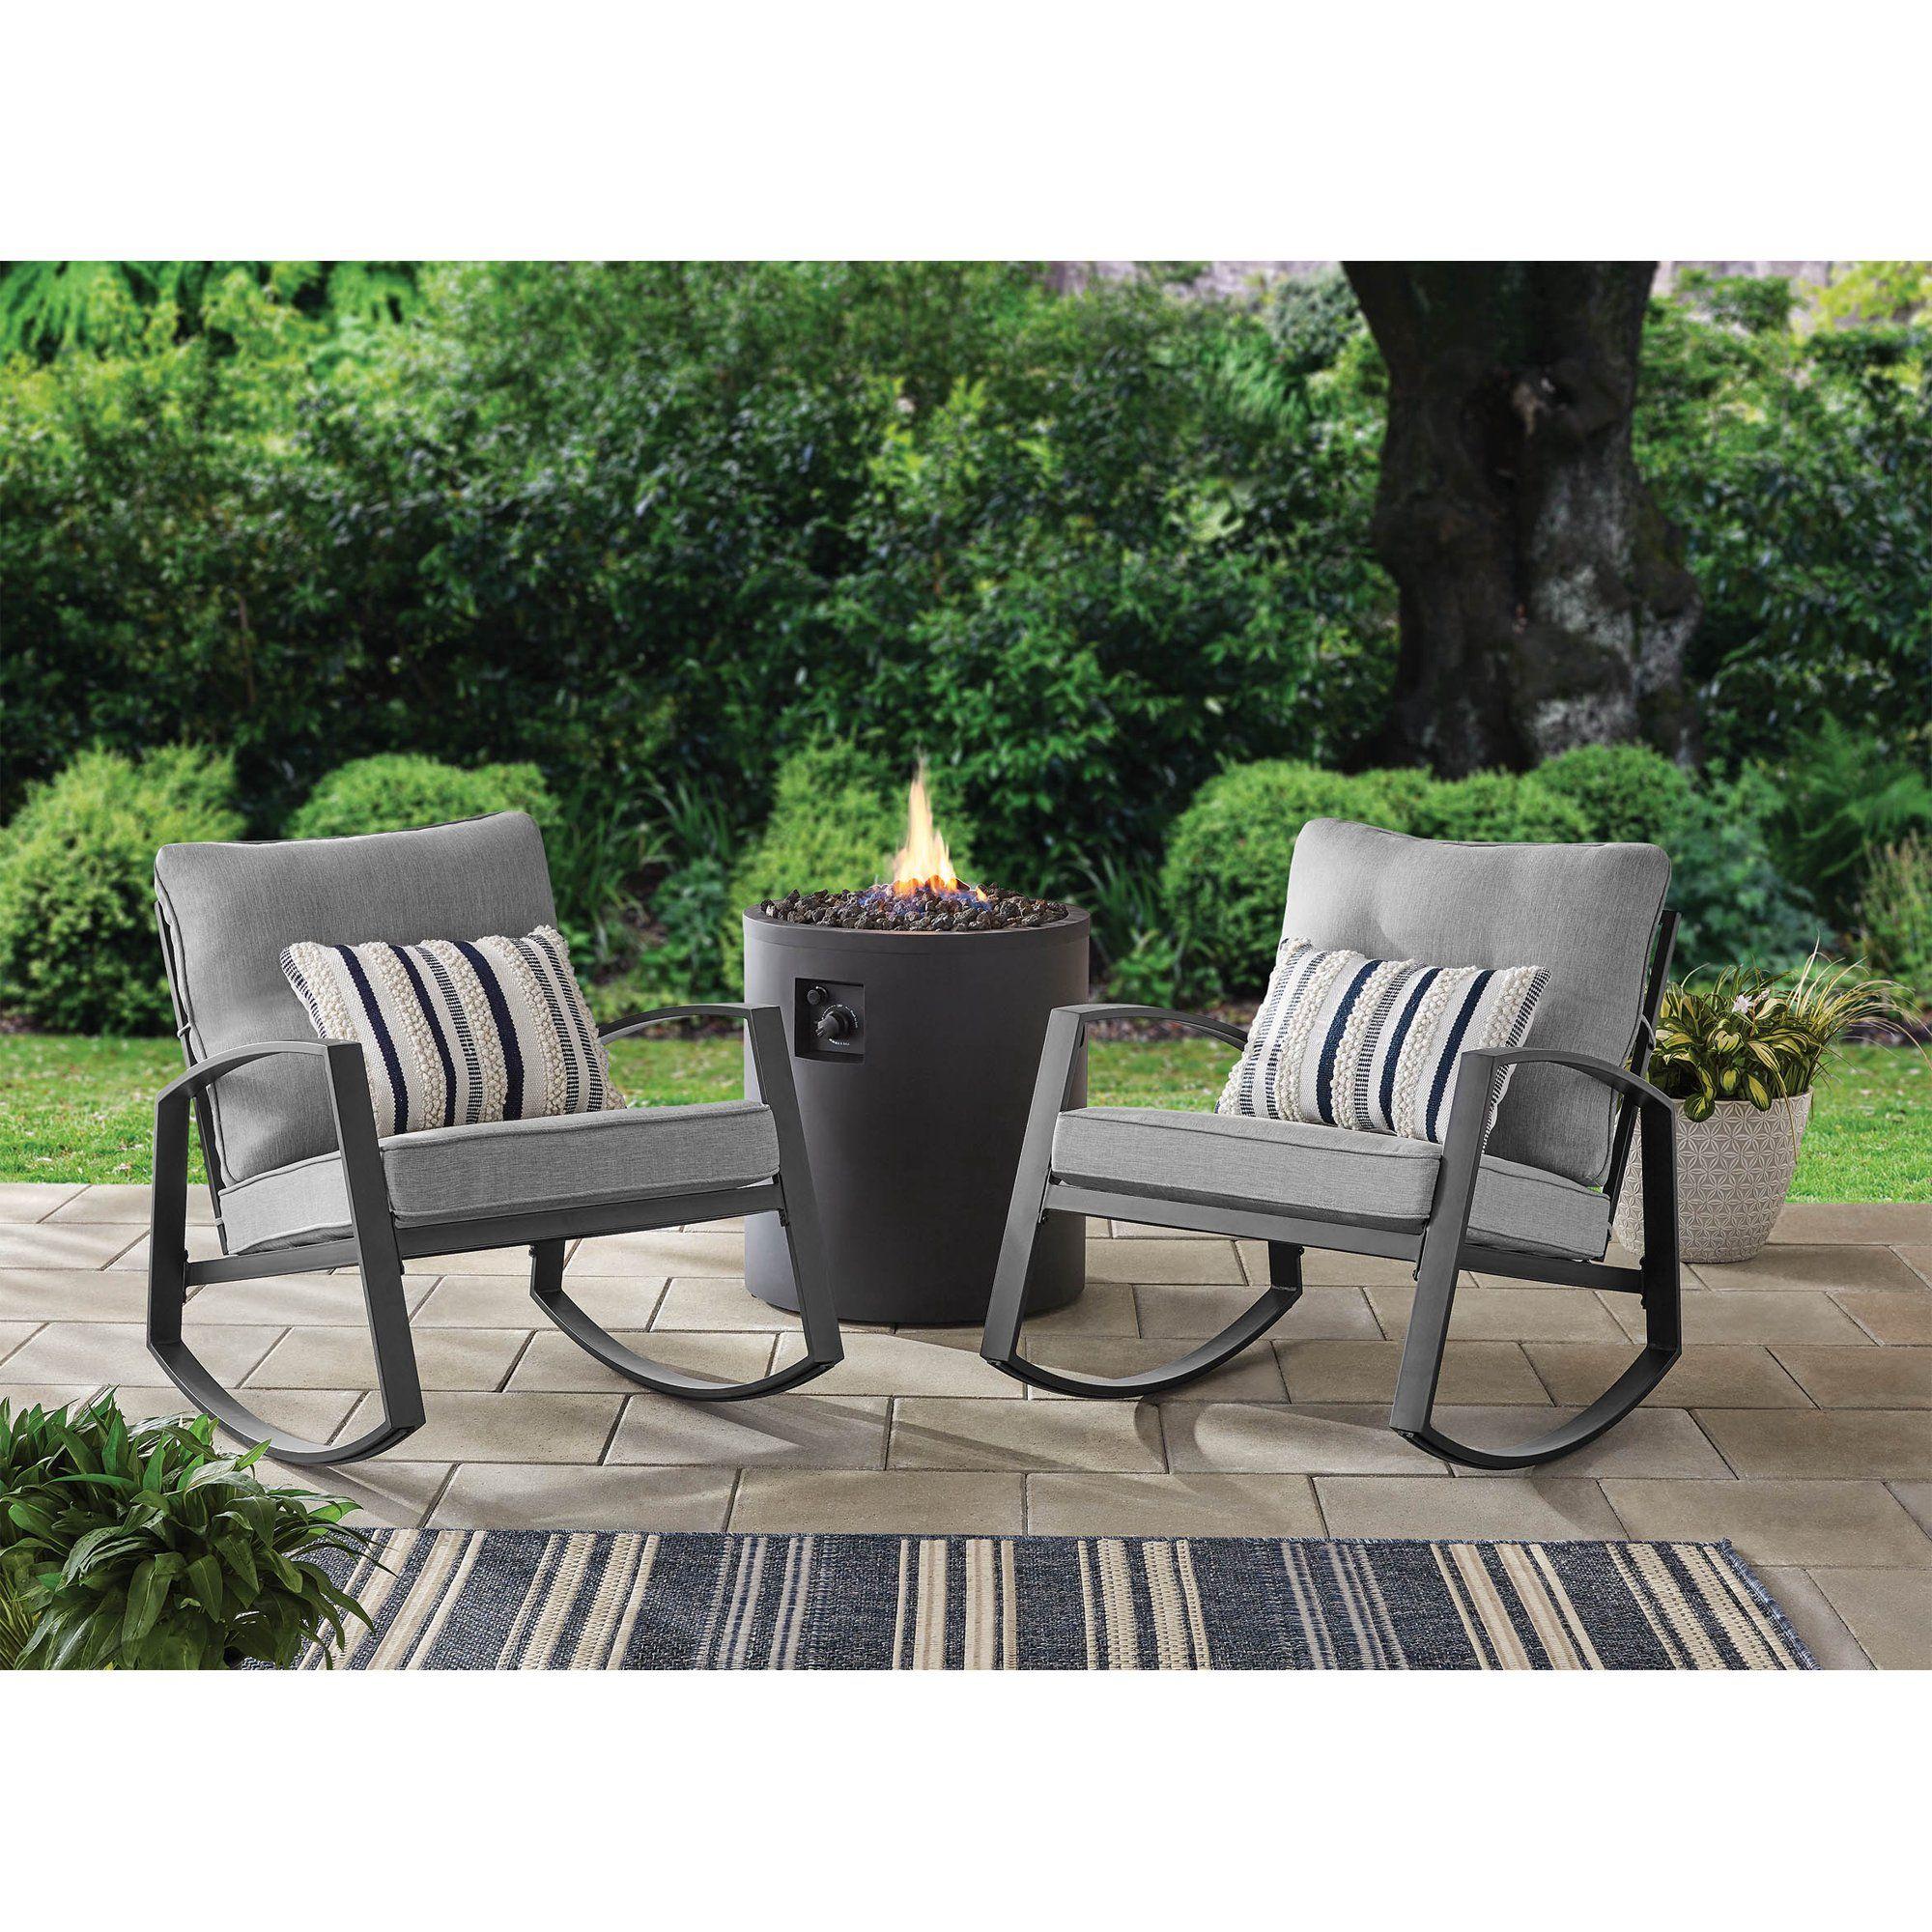 rocking chair set patio rocking chairs